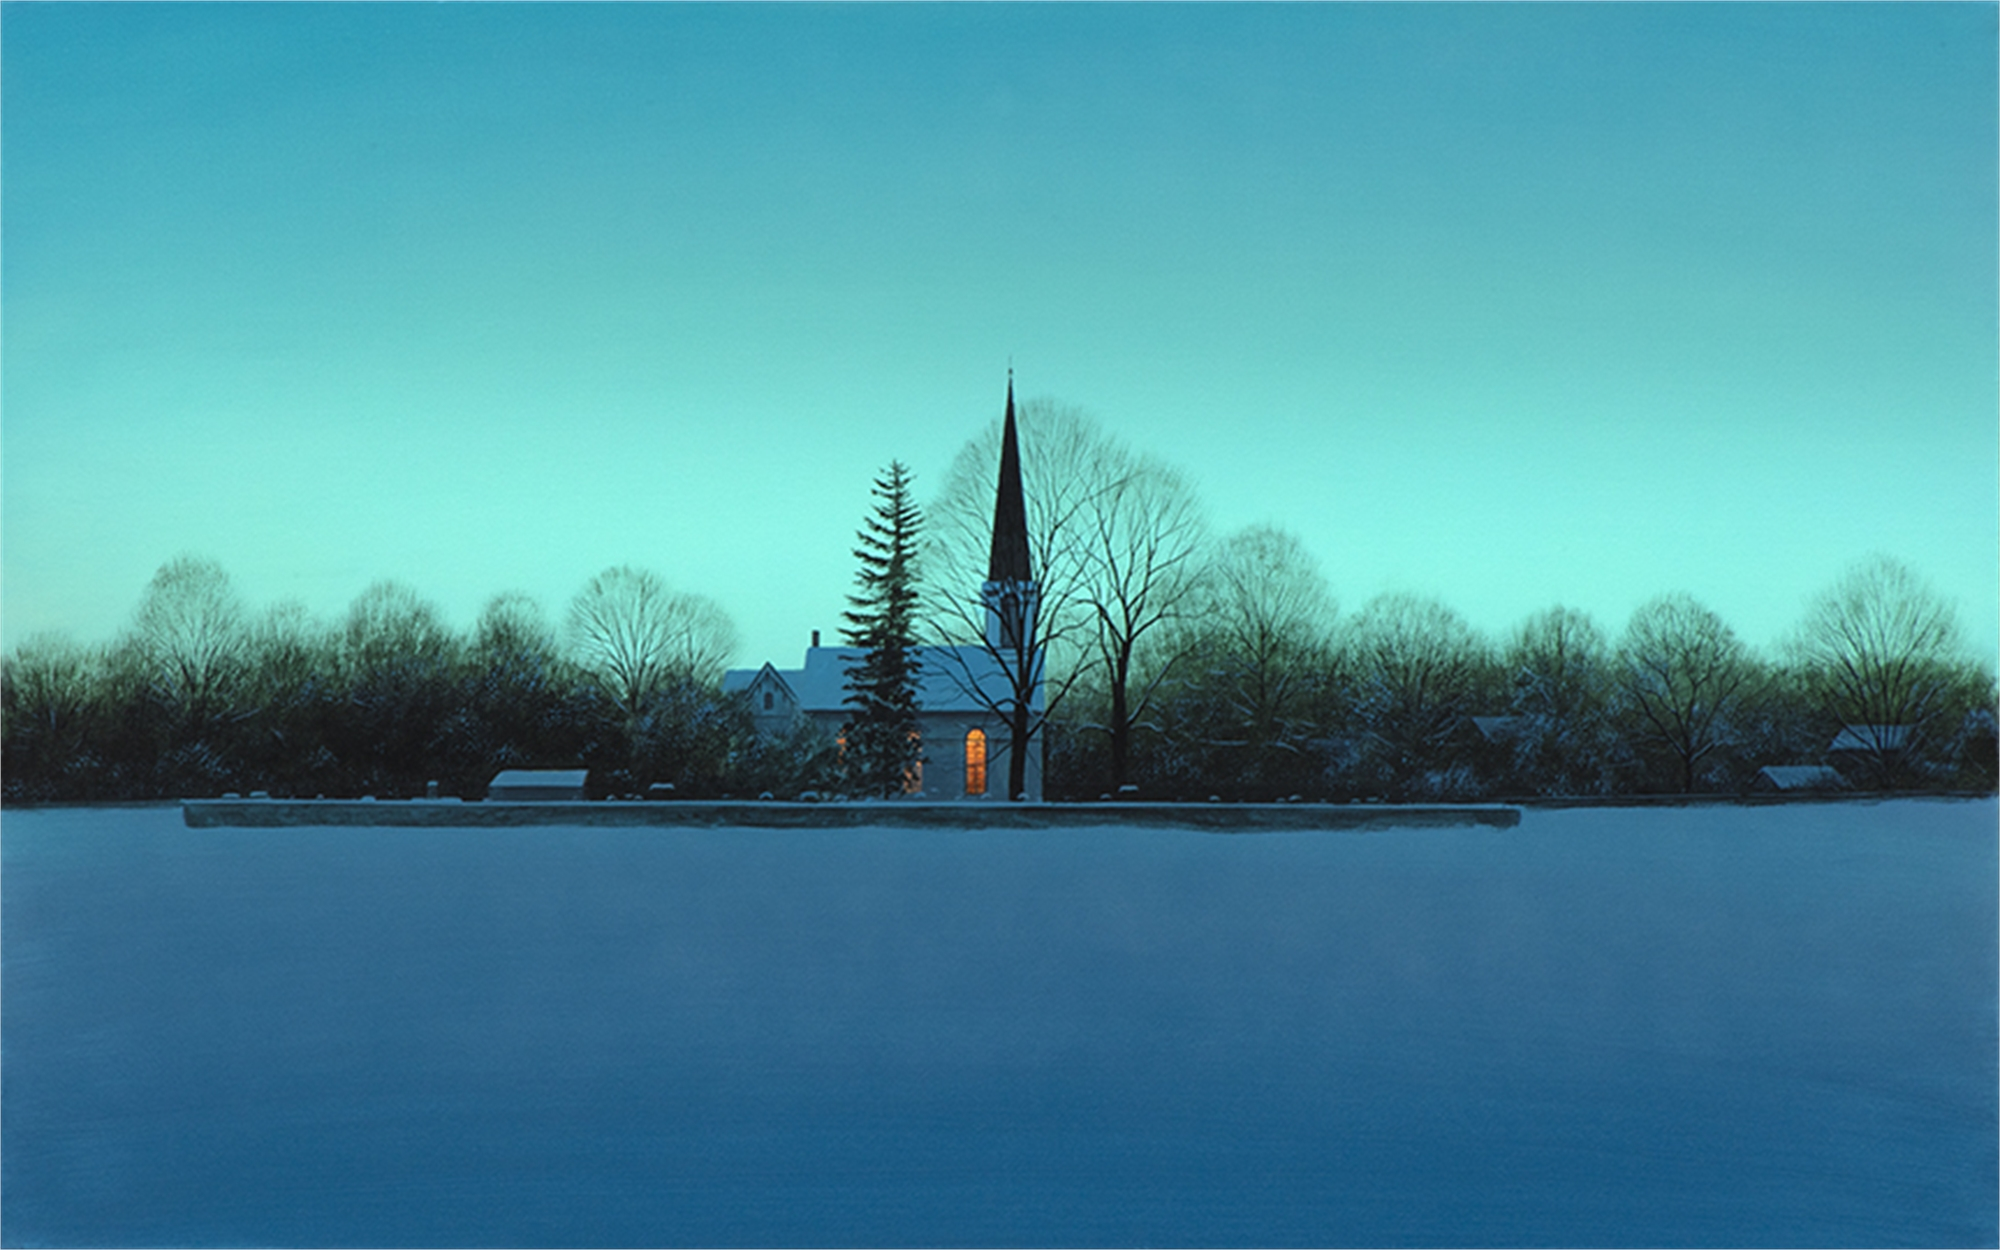 Evensong by Alexander Volkov